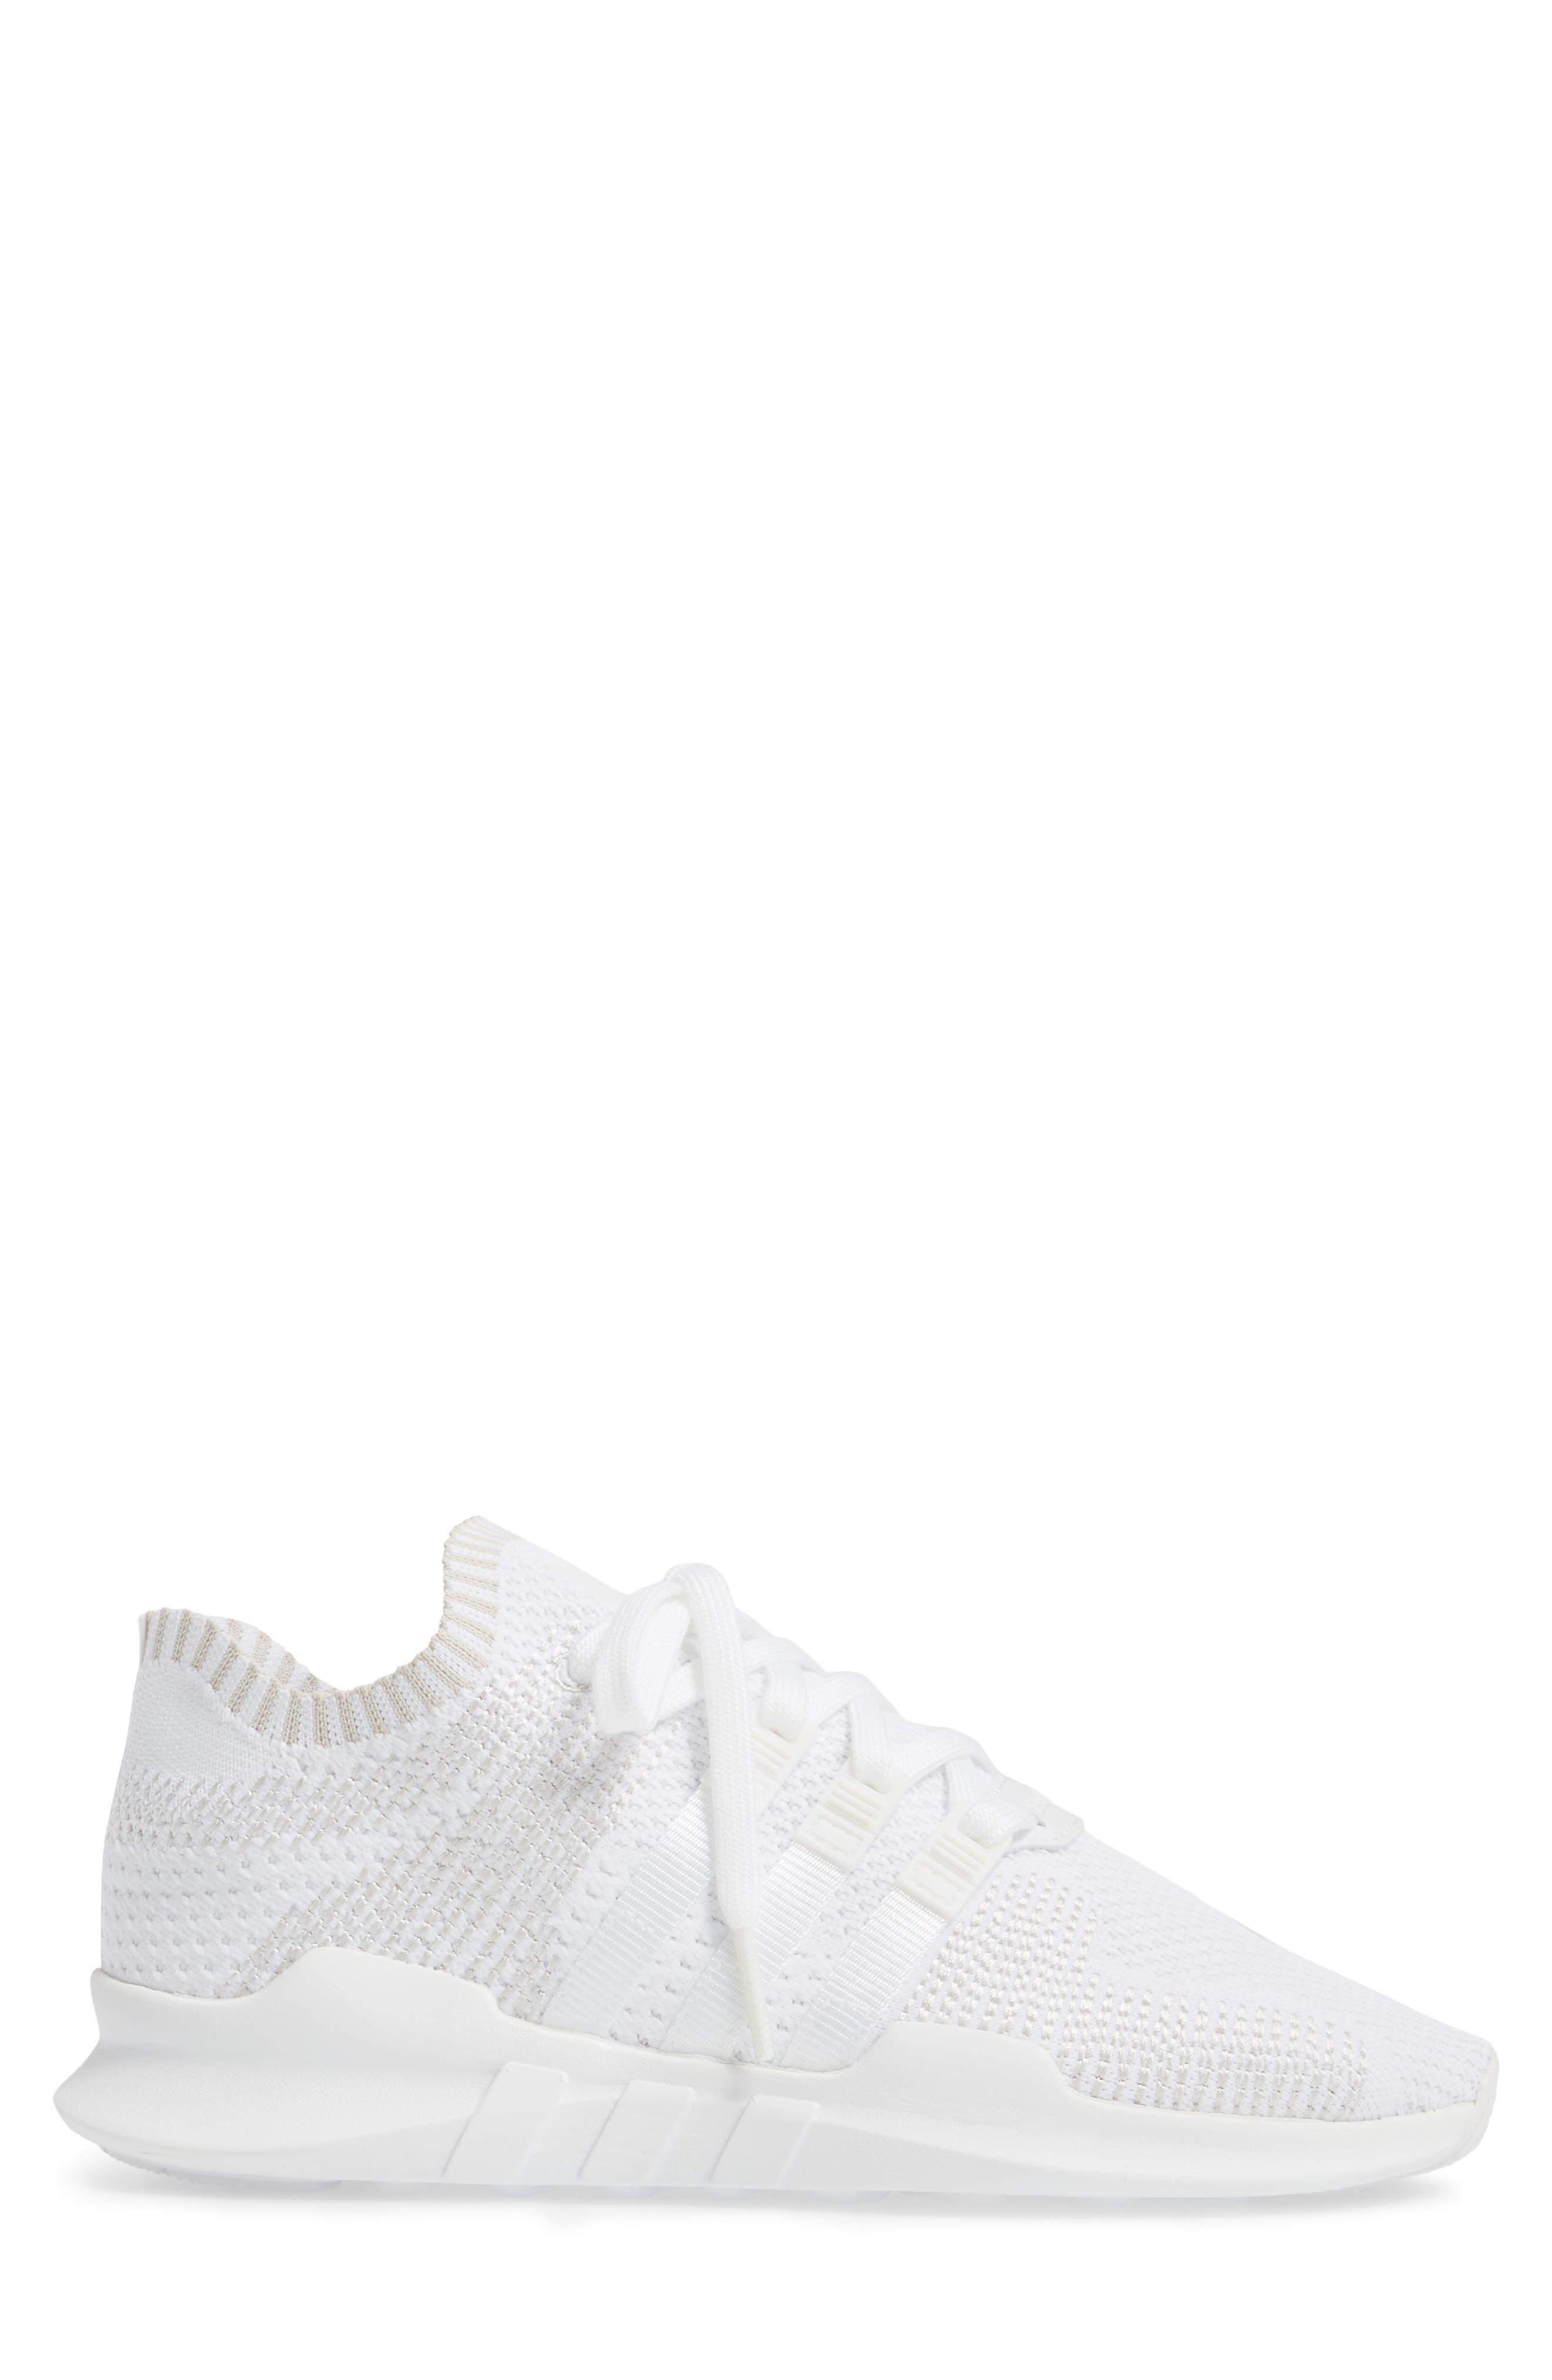 EQT Support ADV PrimeKnit Sneaker,                             Alternate thumbnail 6, color,